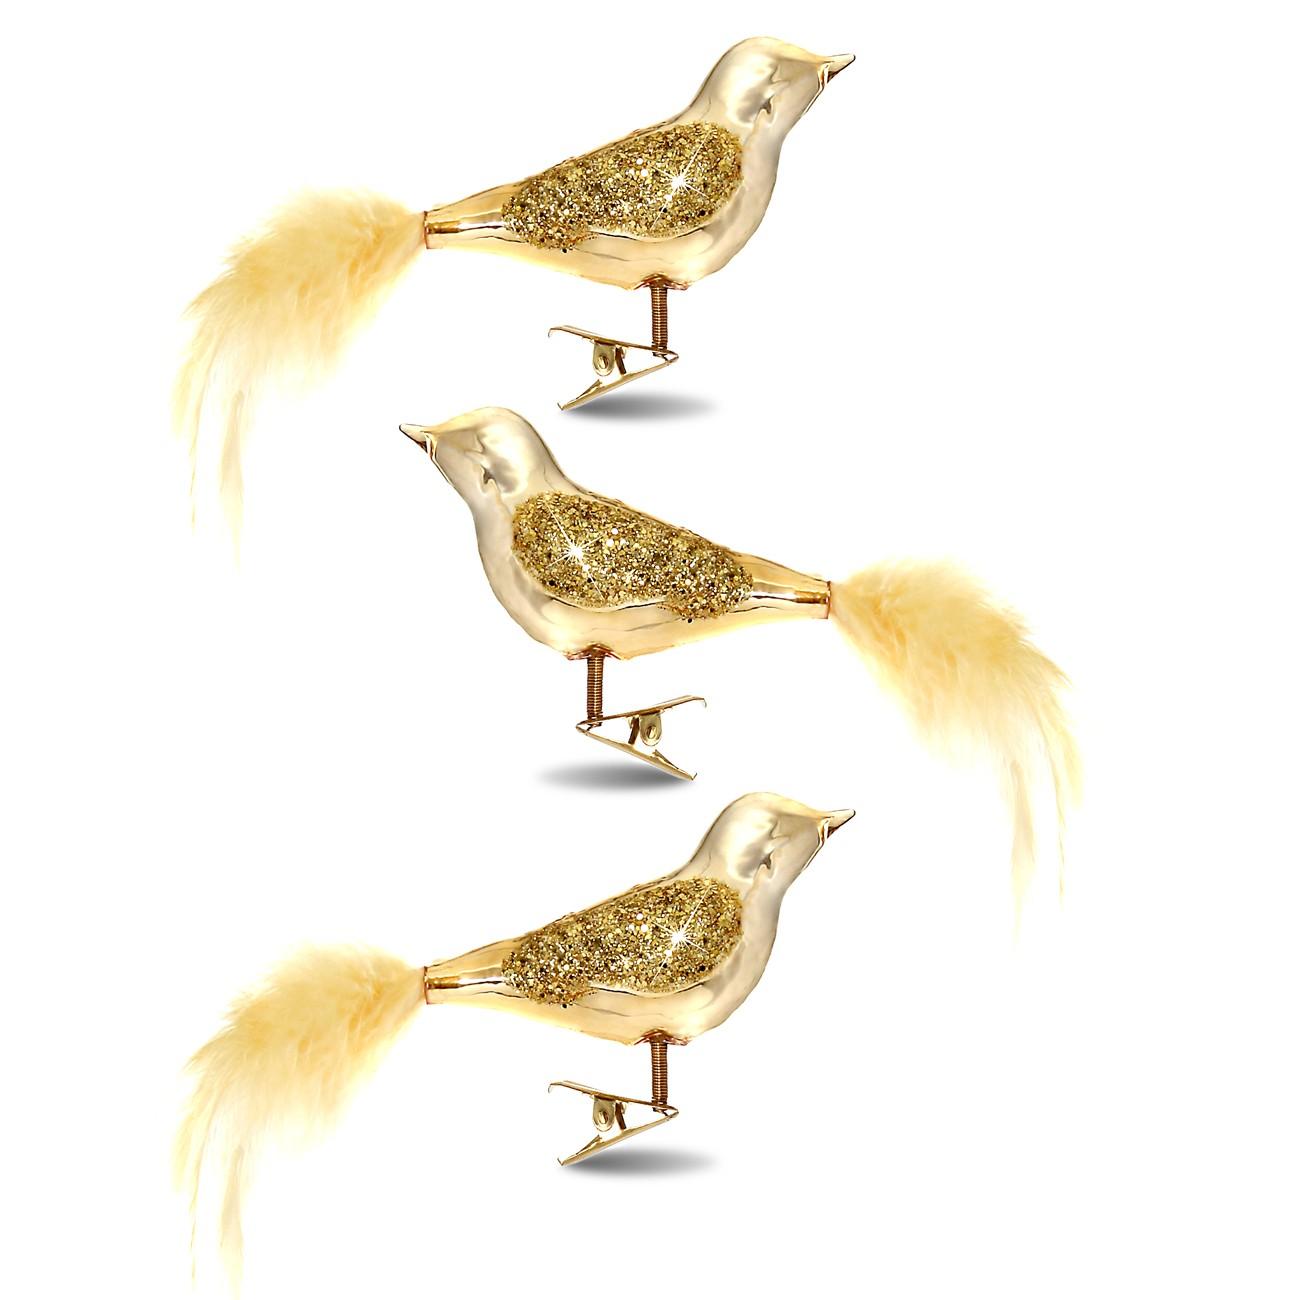 sikora christbaumschmuck glas ornament clip vogel mit federn und pailletten gold 3er set. Black Bedroom Furniture Sets. Home Design Ideas